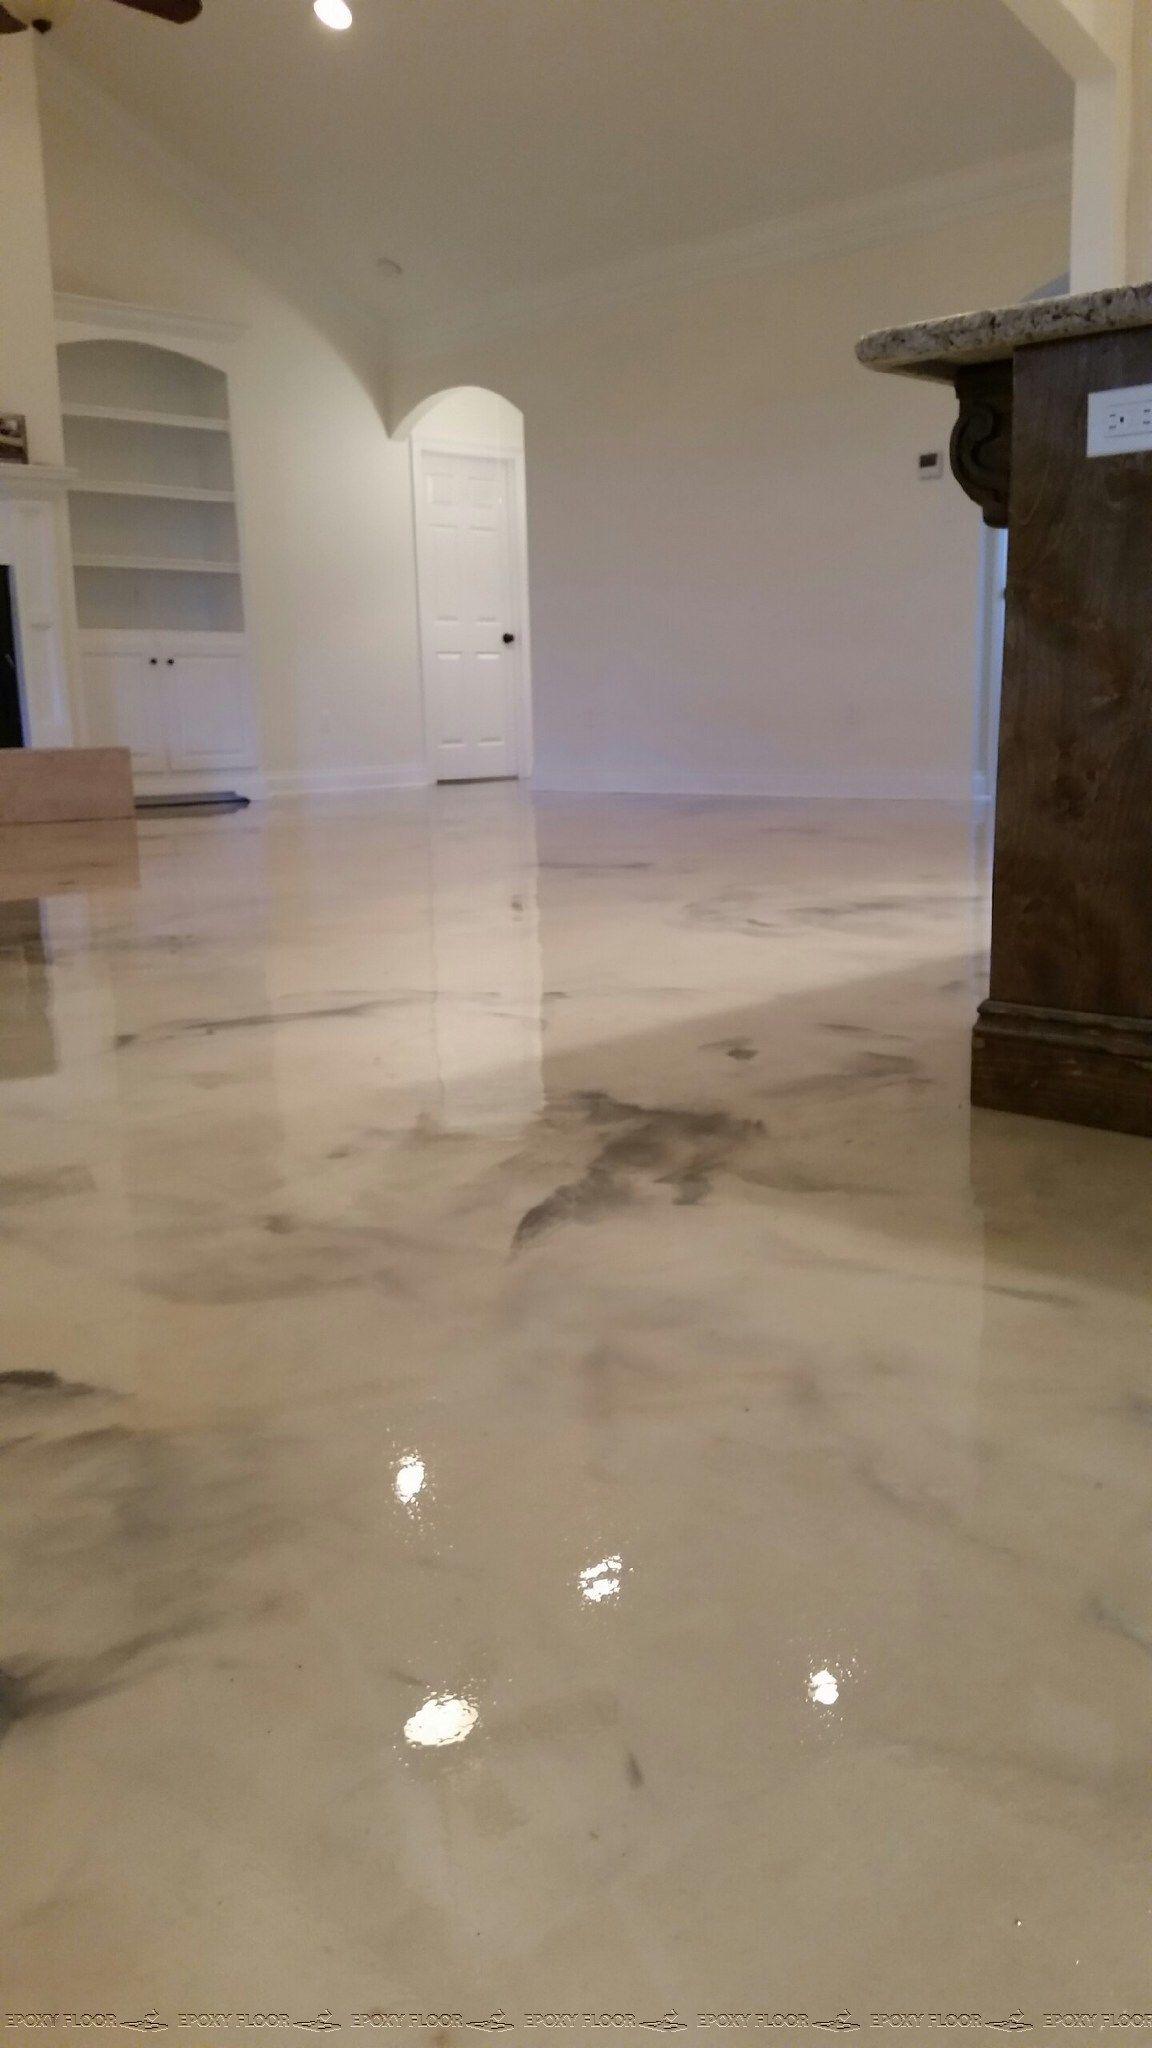 garage floor epoxy 100 solids, 2020 Beton döşeme